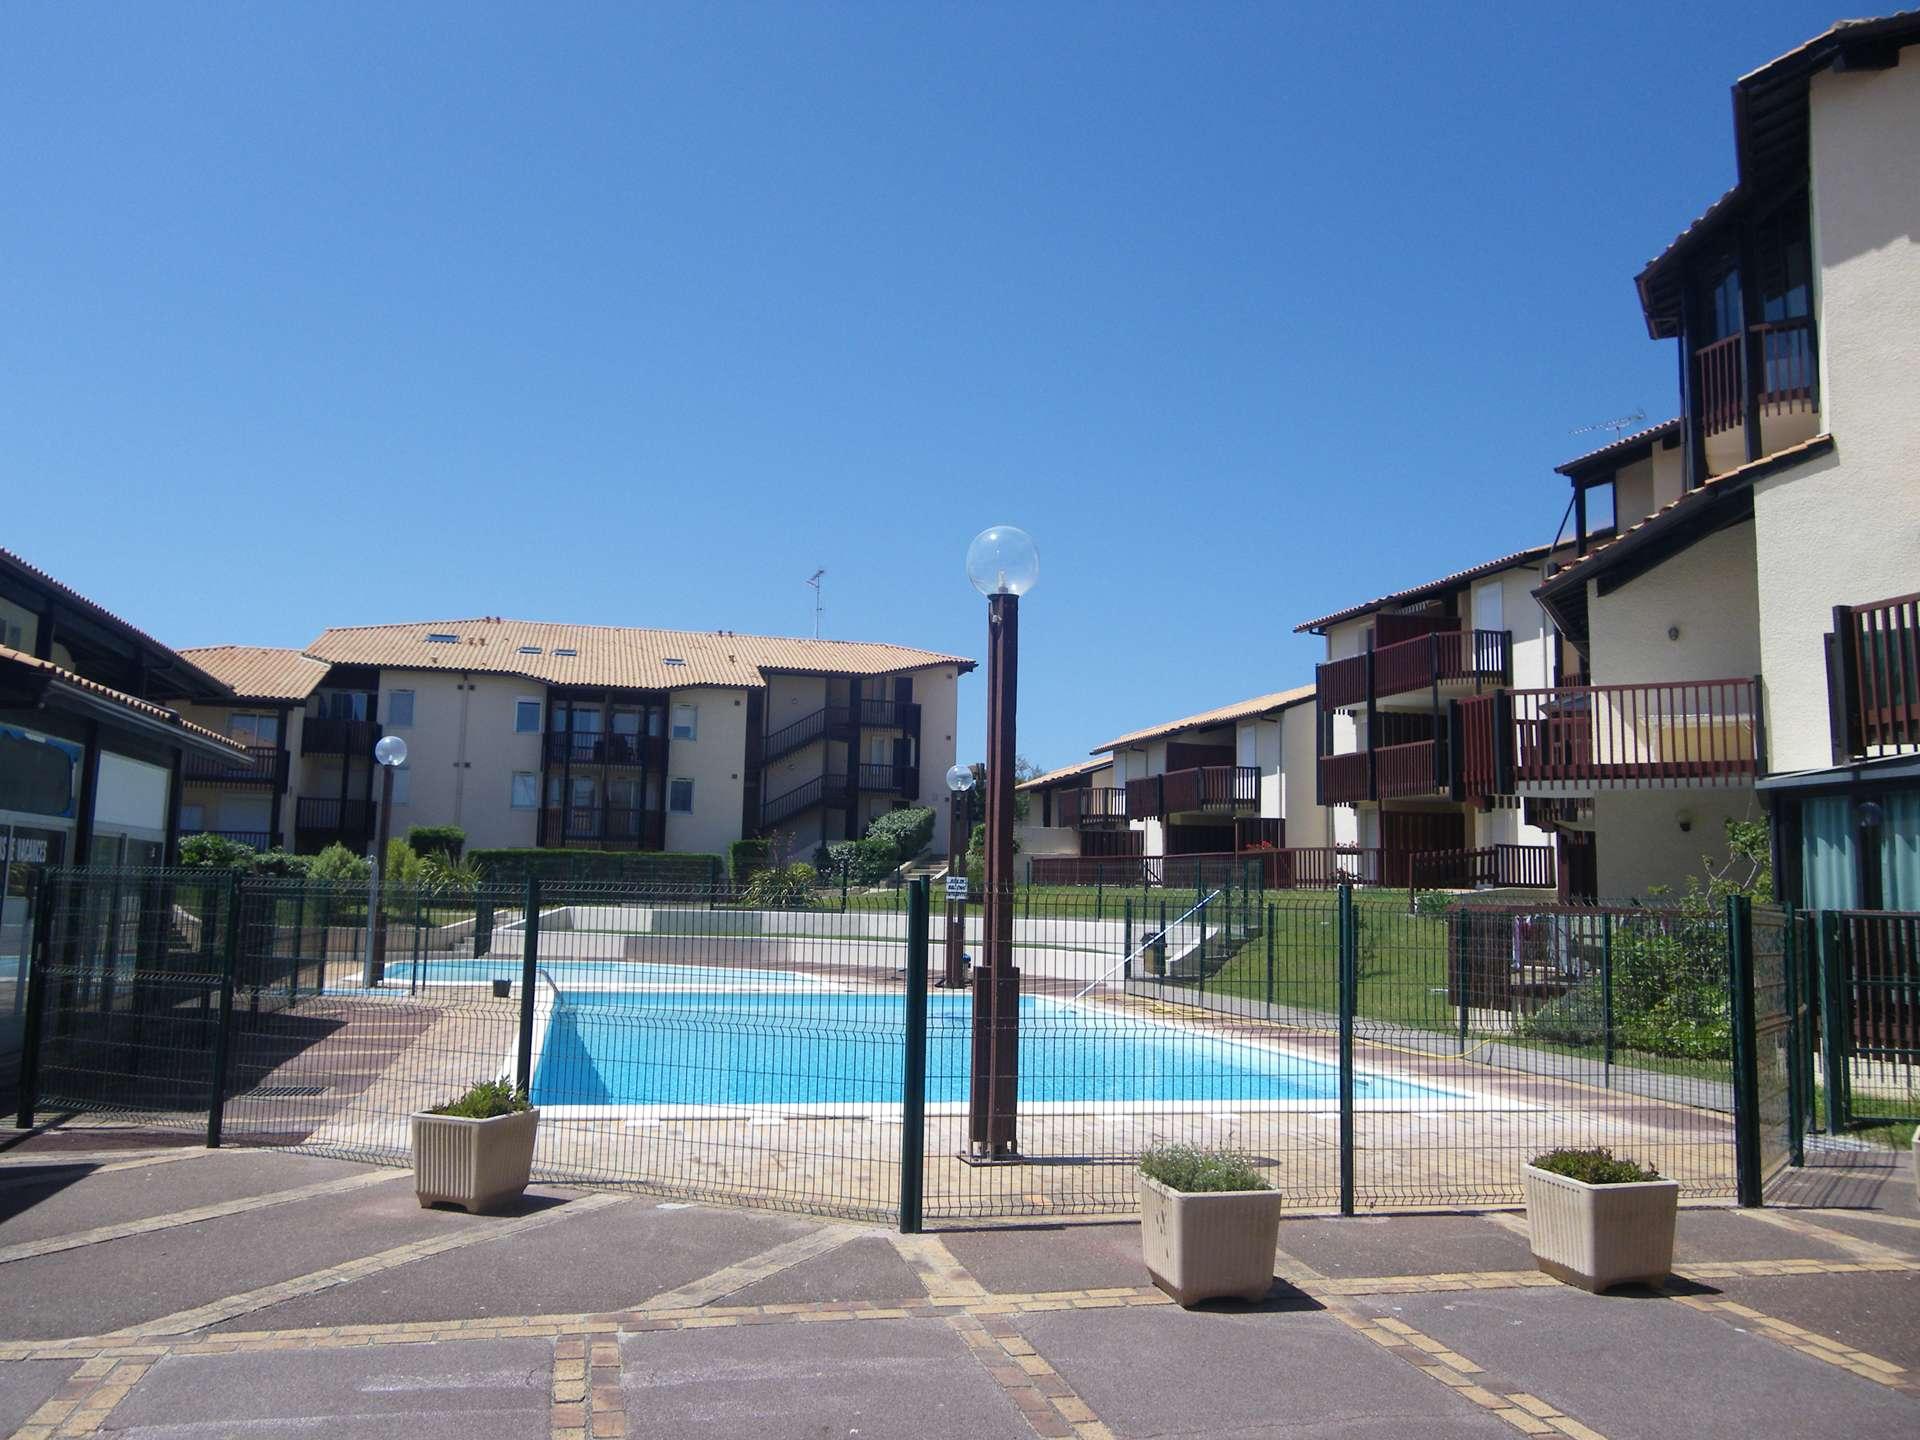 holiday rental Apartment in Vieux Boucau